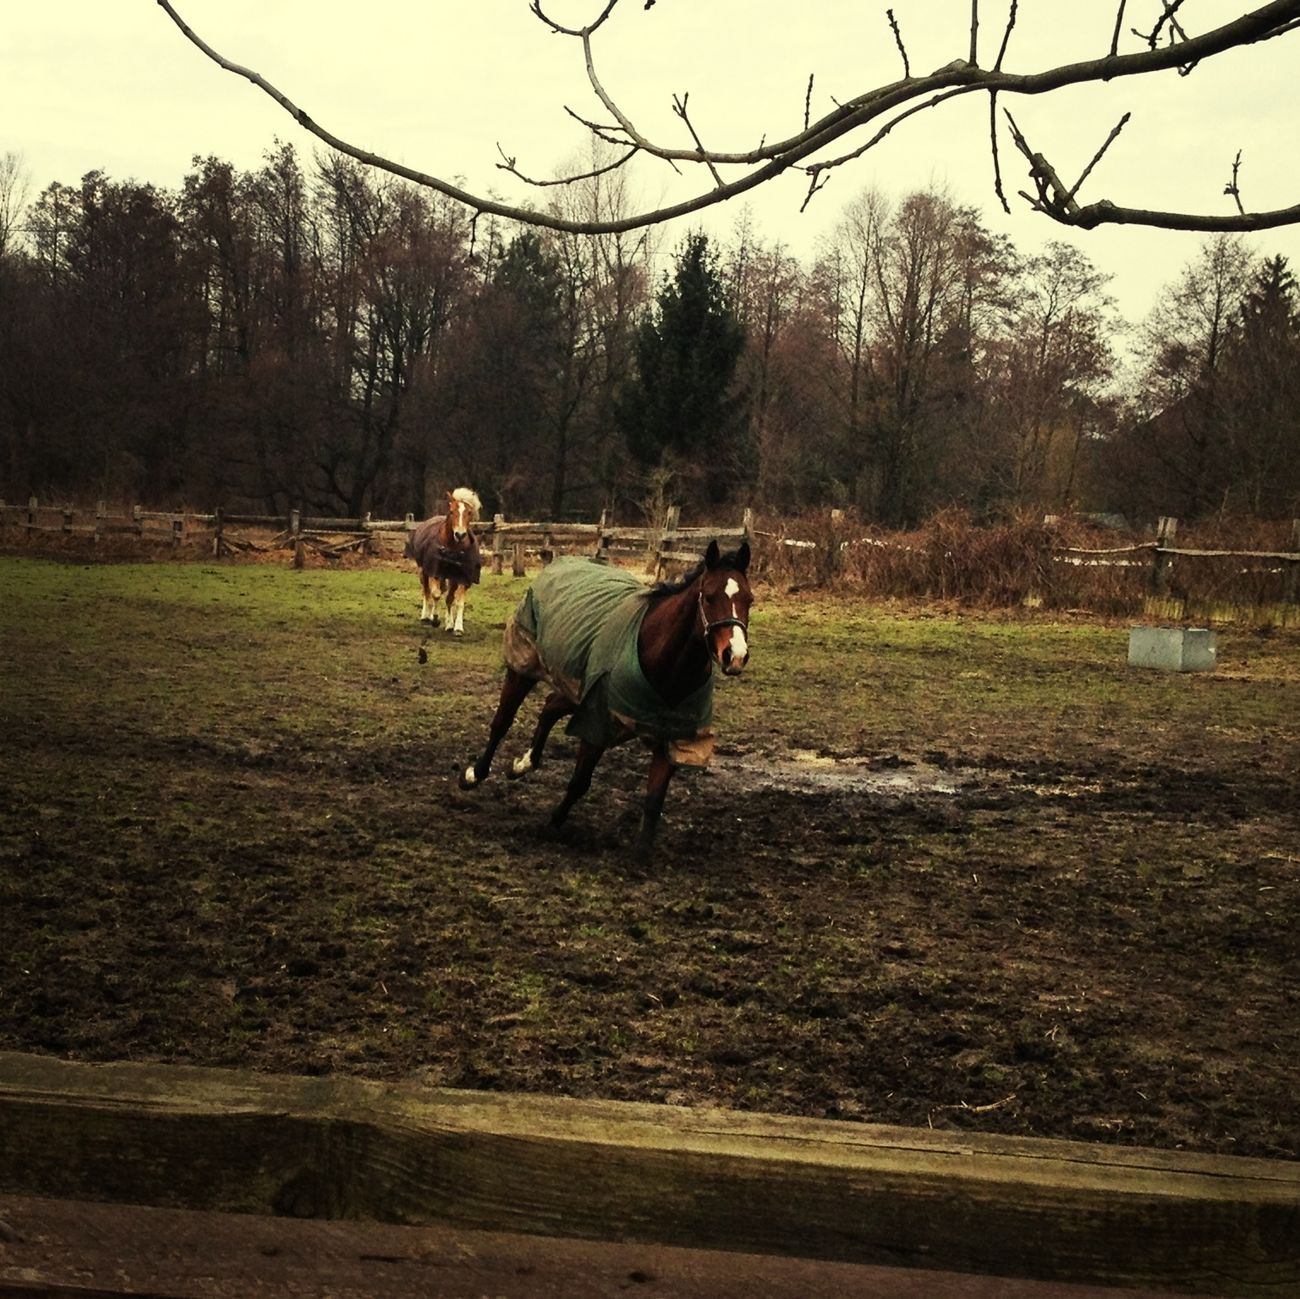 Galopp Taking Photos Horses Galopp Dynamic